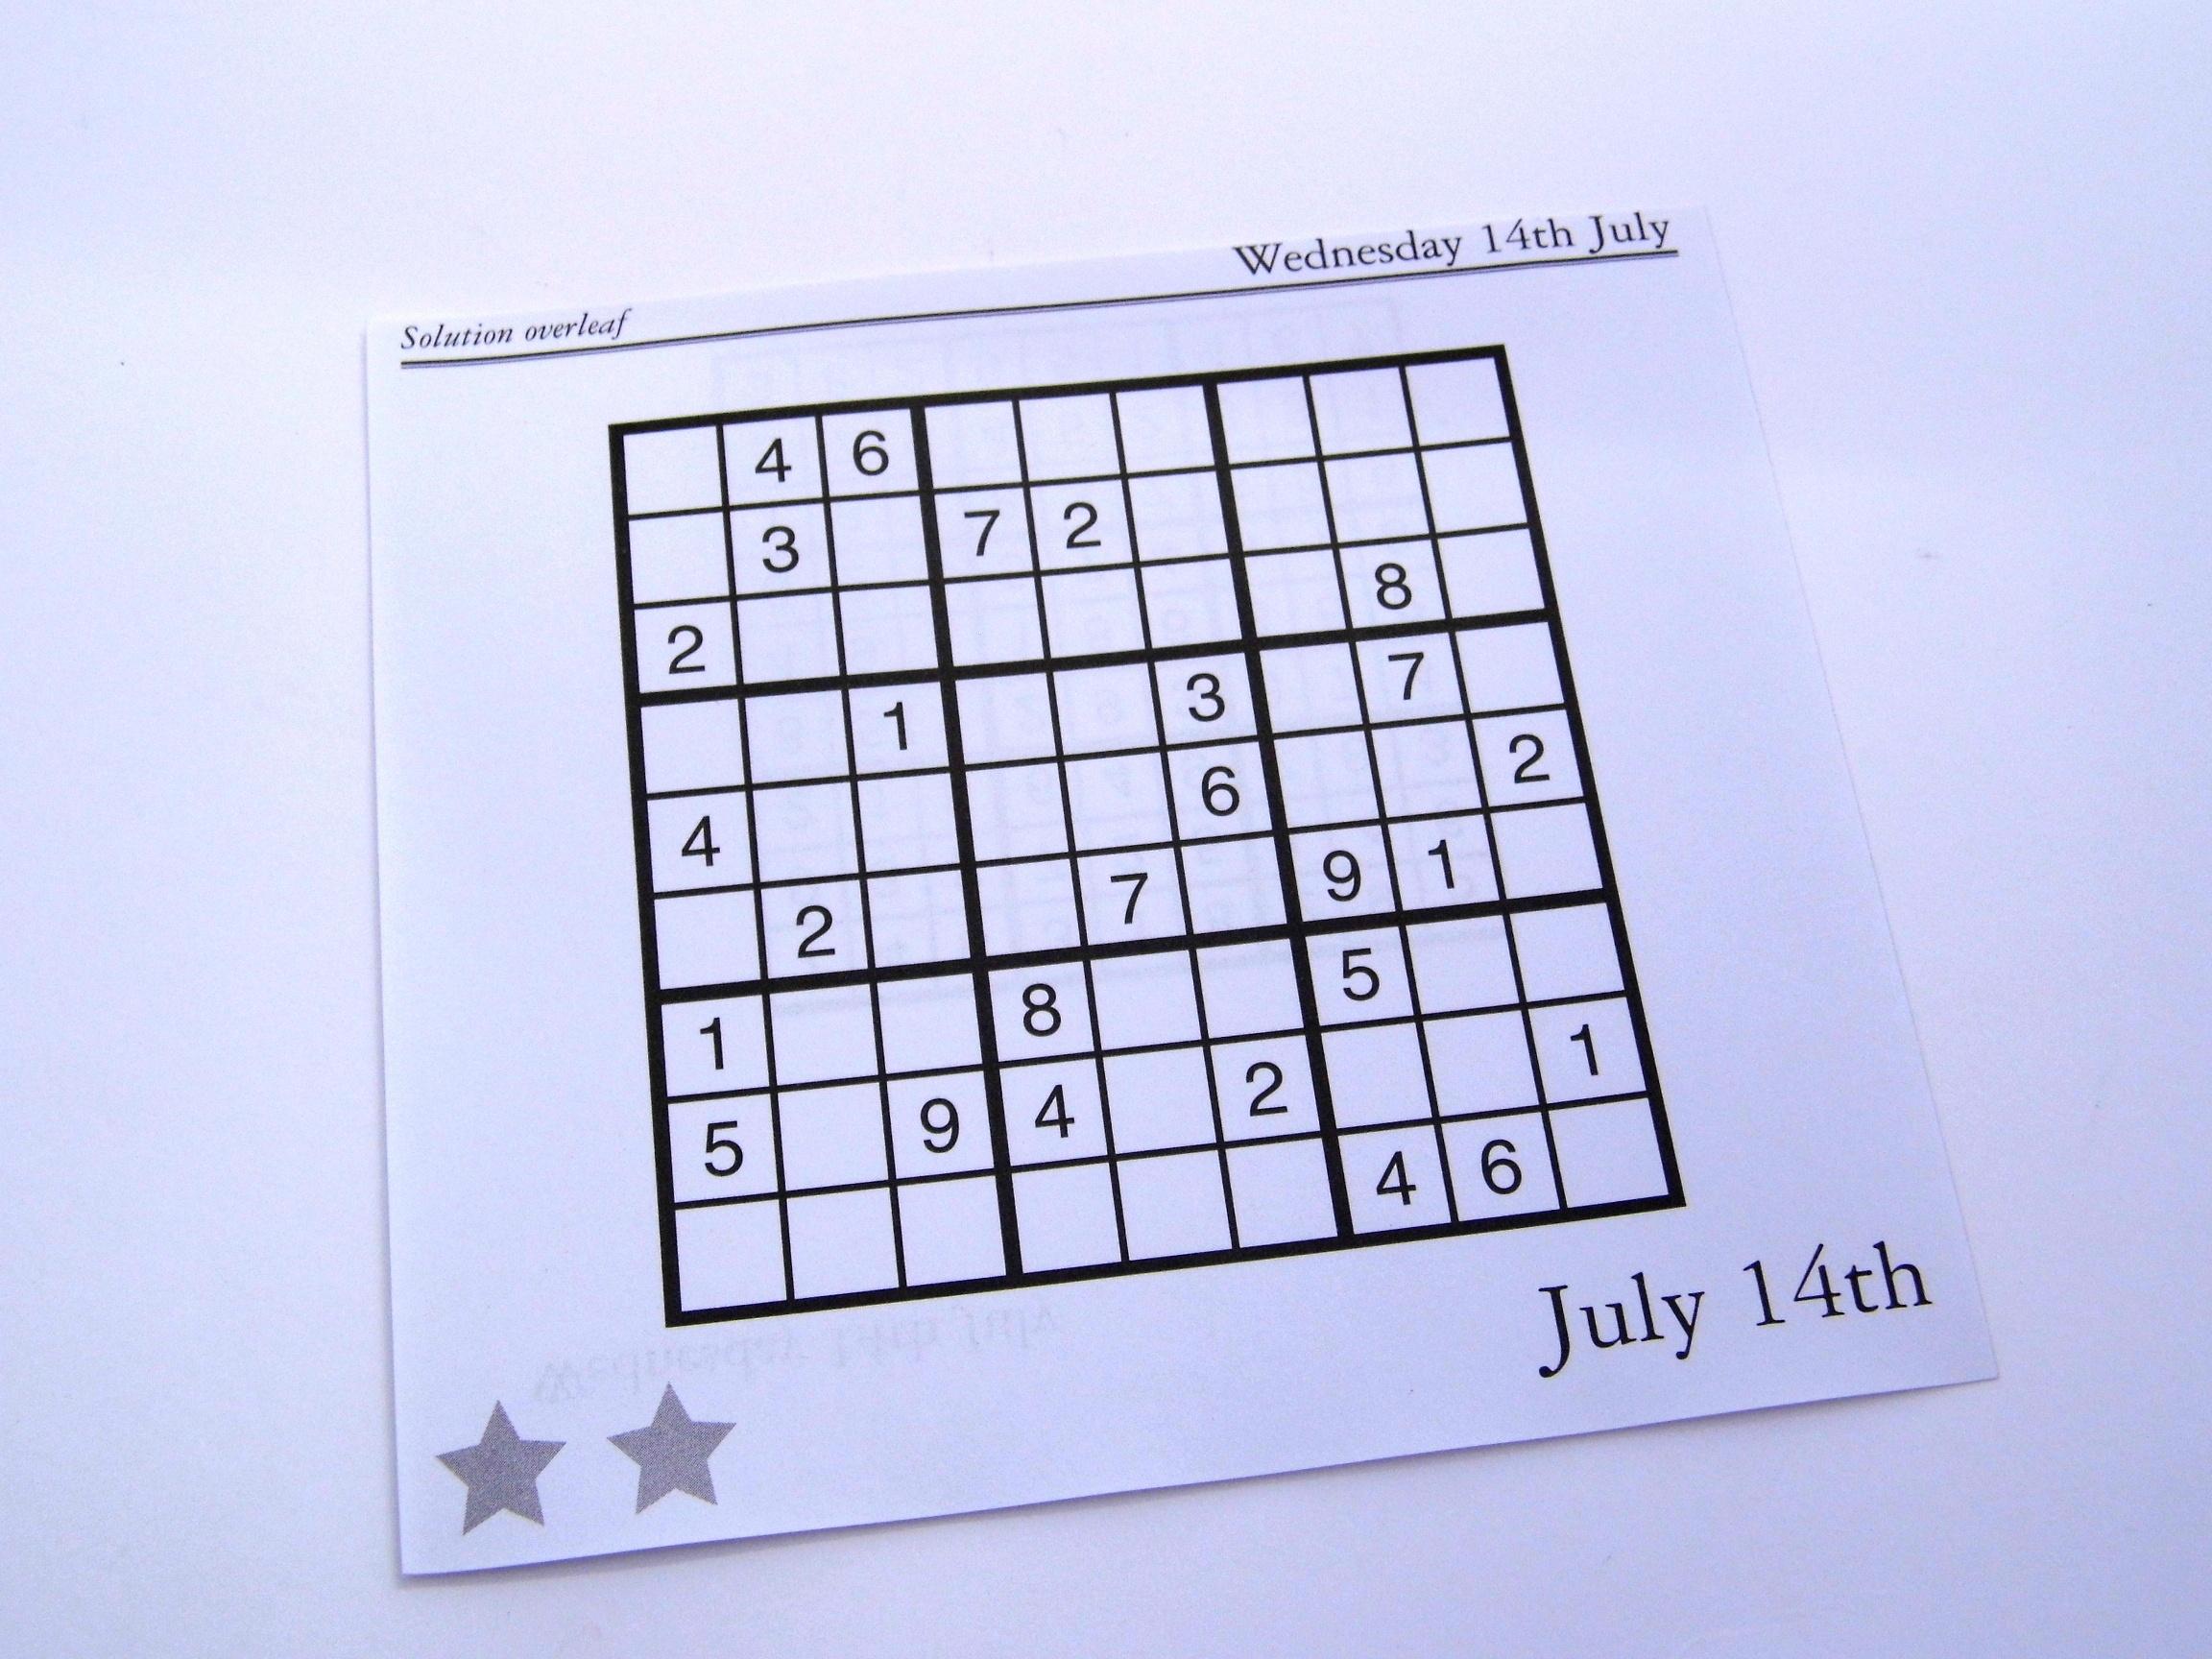 Archive Evil Puzzles – Free Sudoku Puzzles - Free Printable Sudoku 6 Per Page